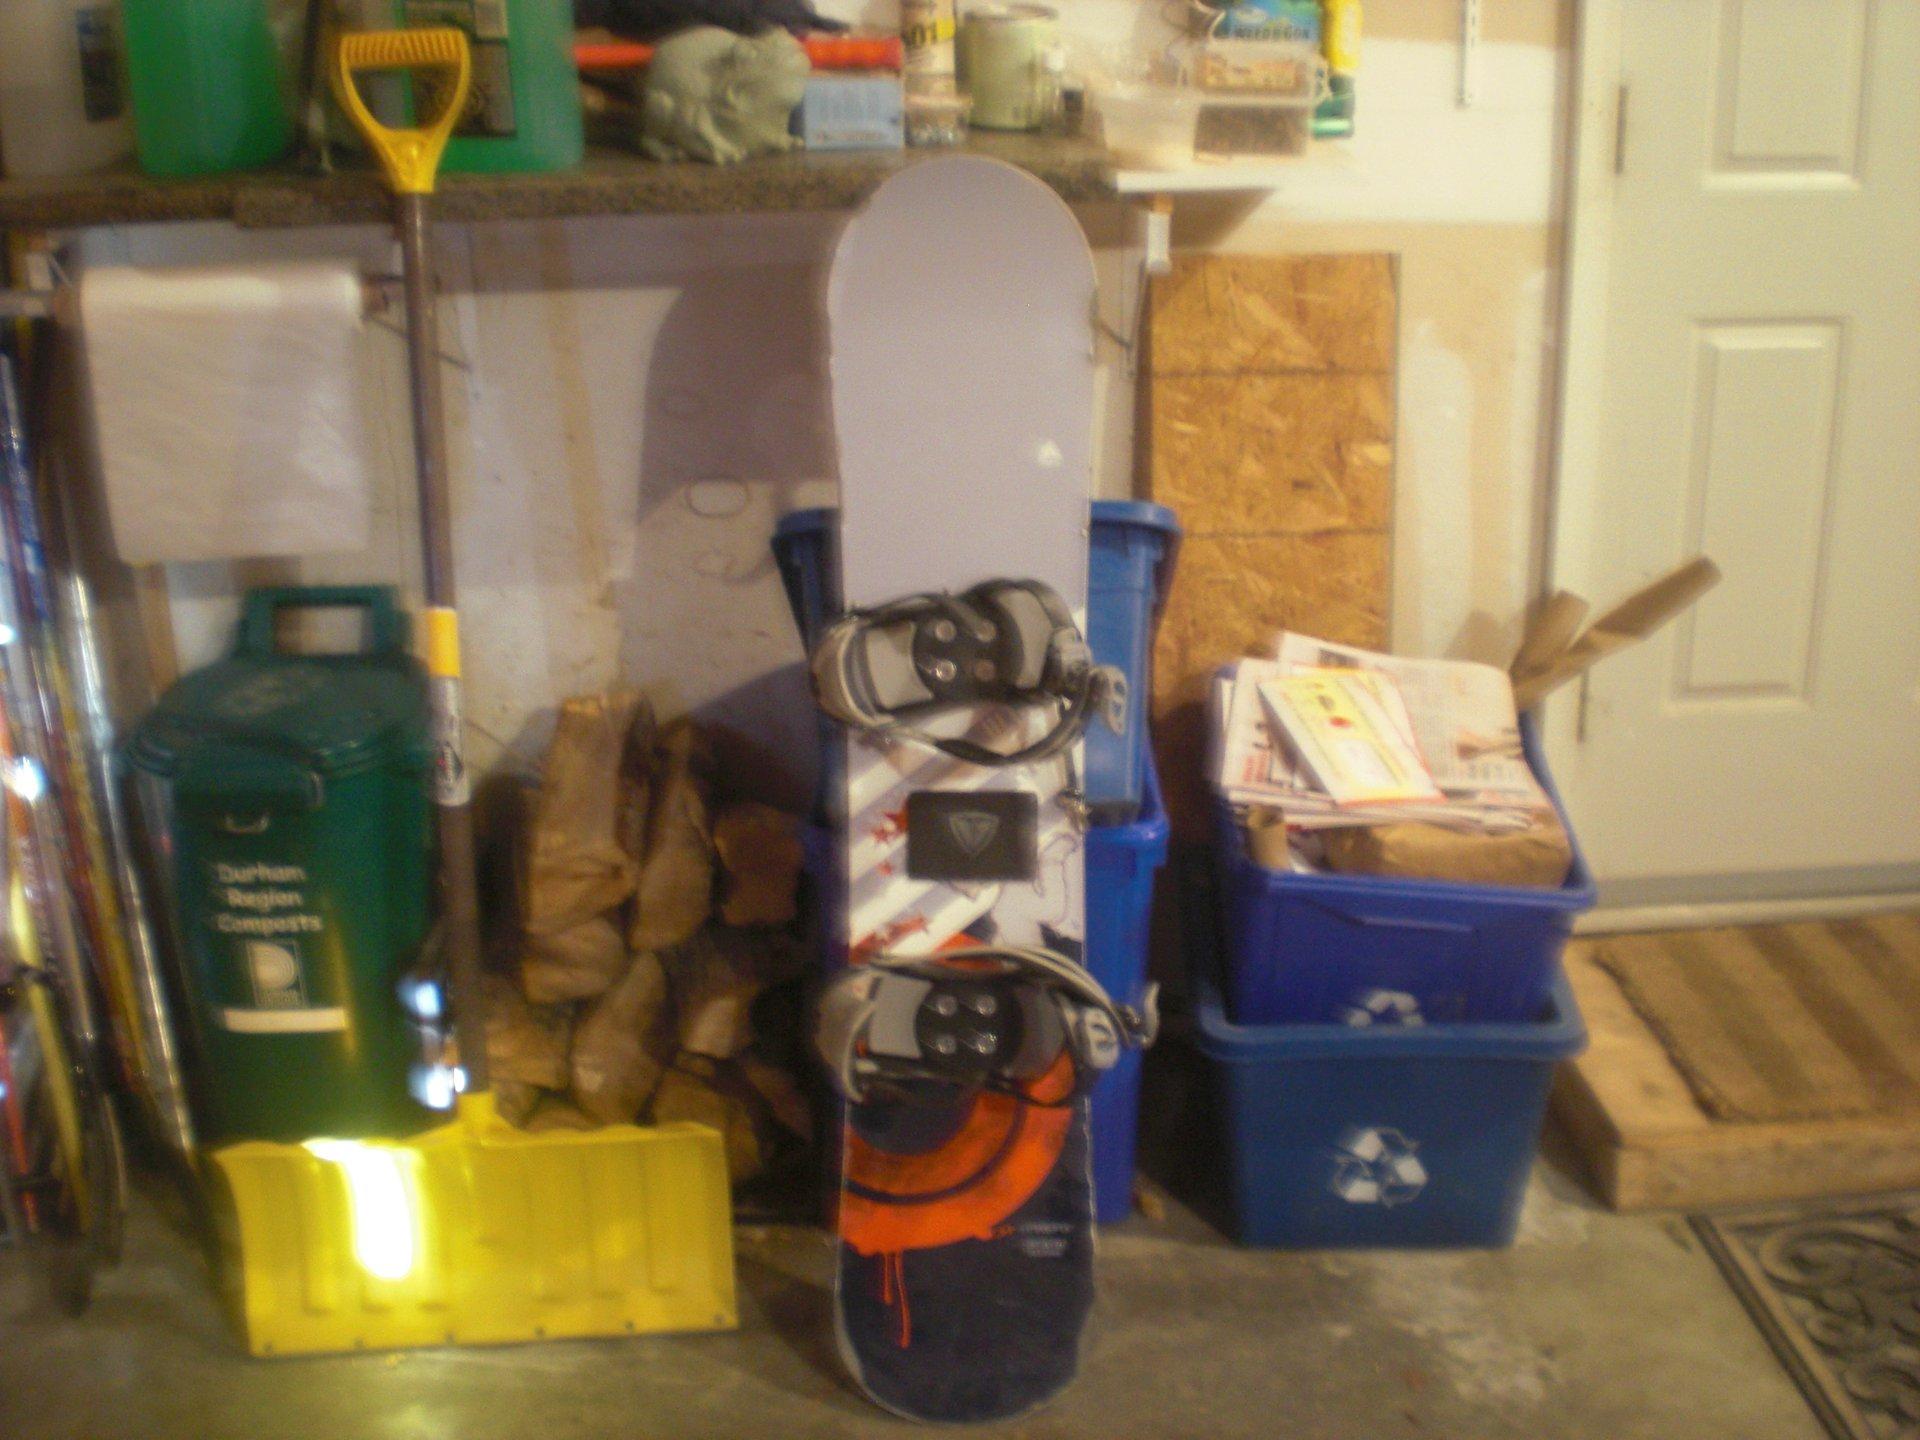 Snowboard 4 sale